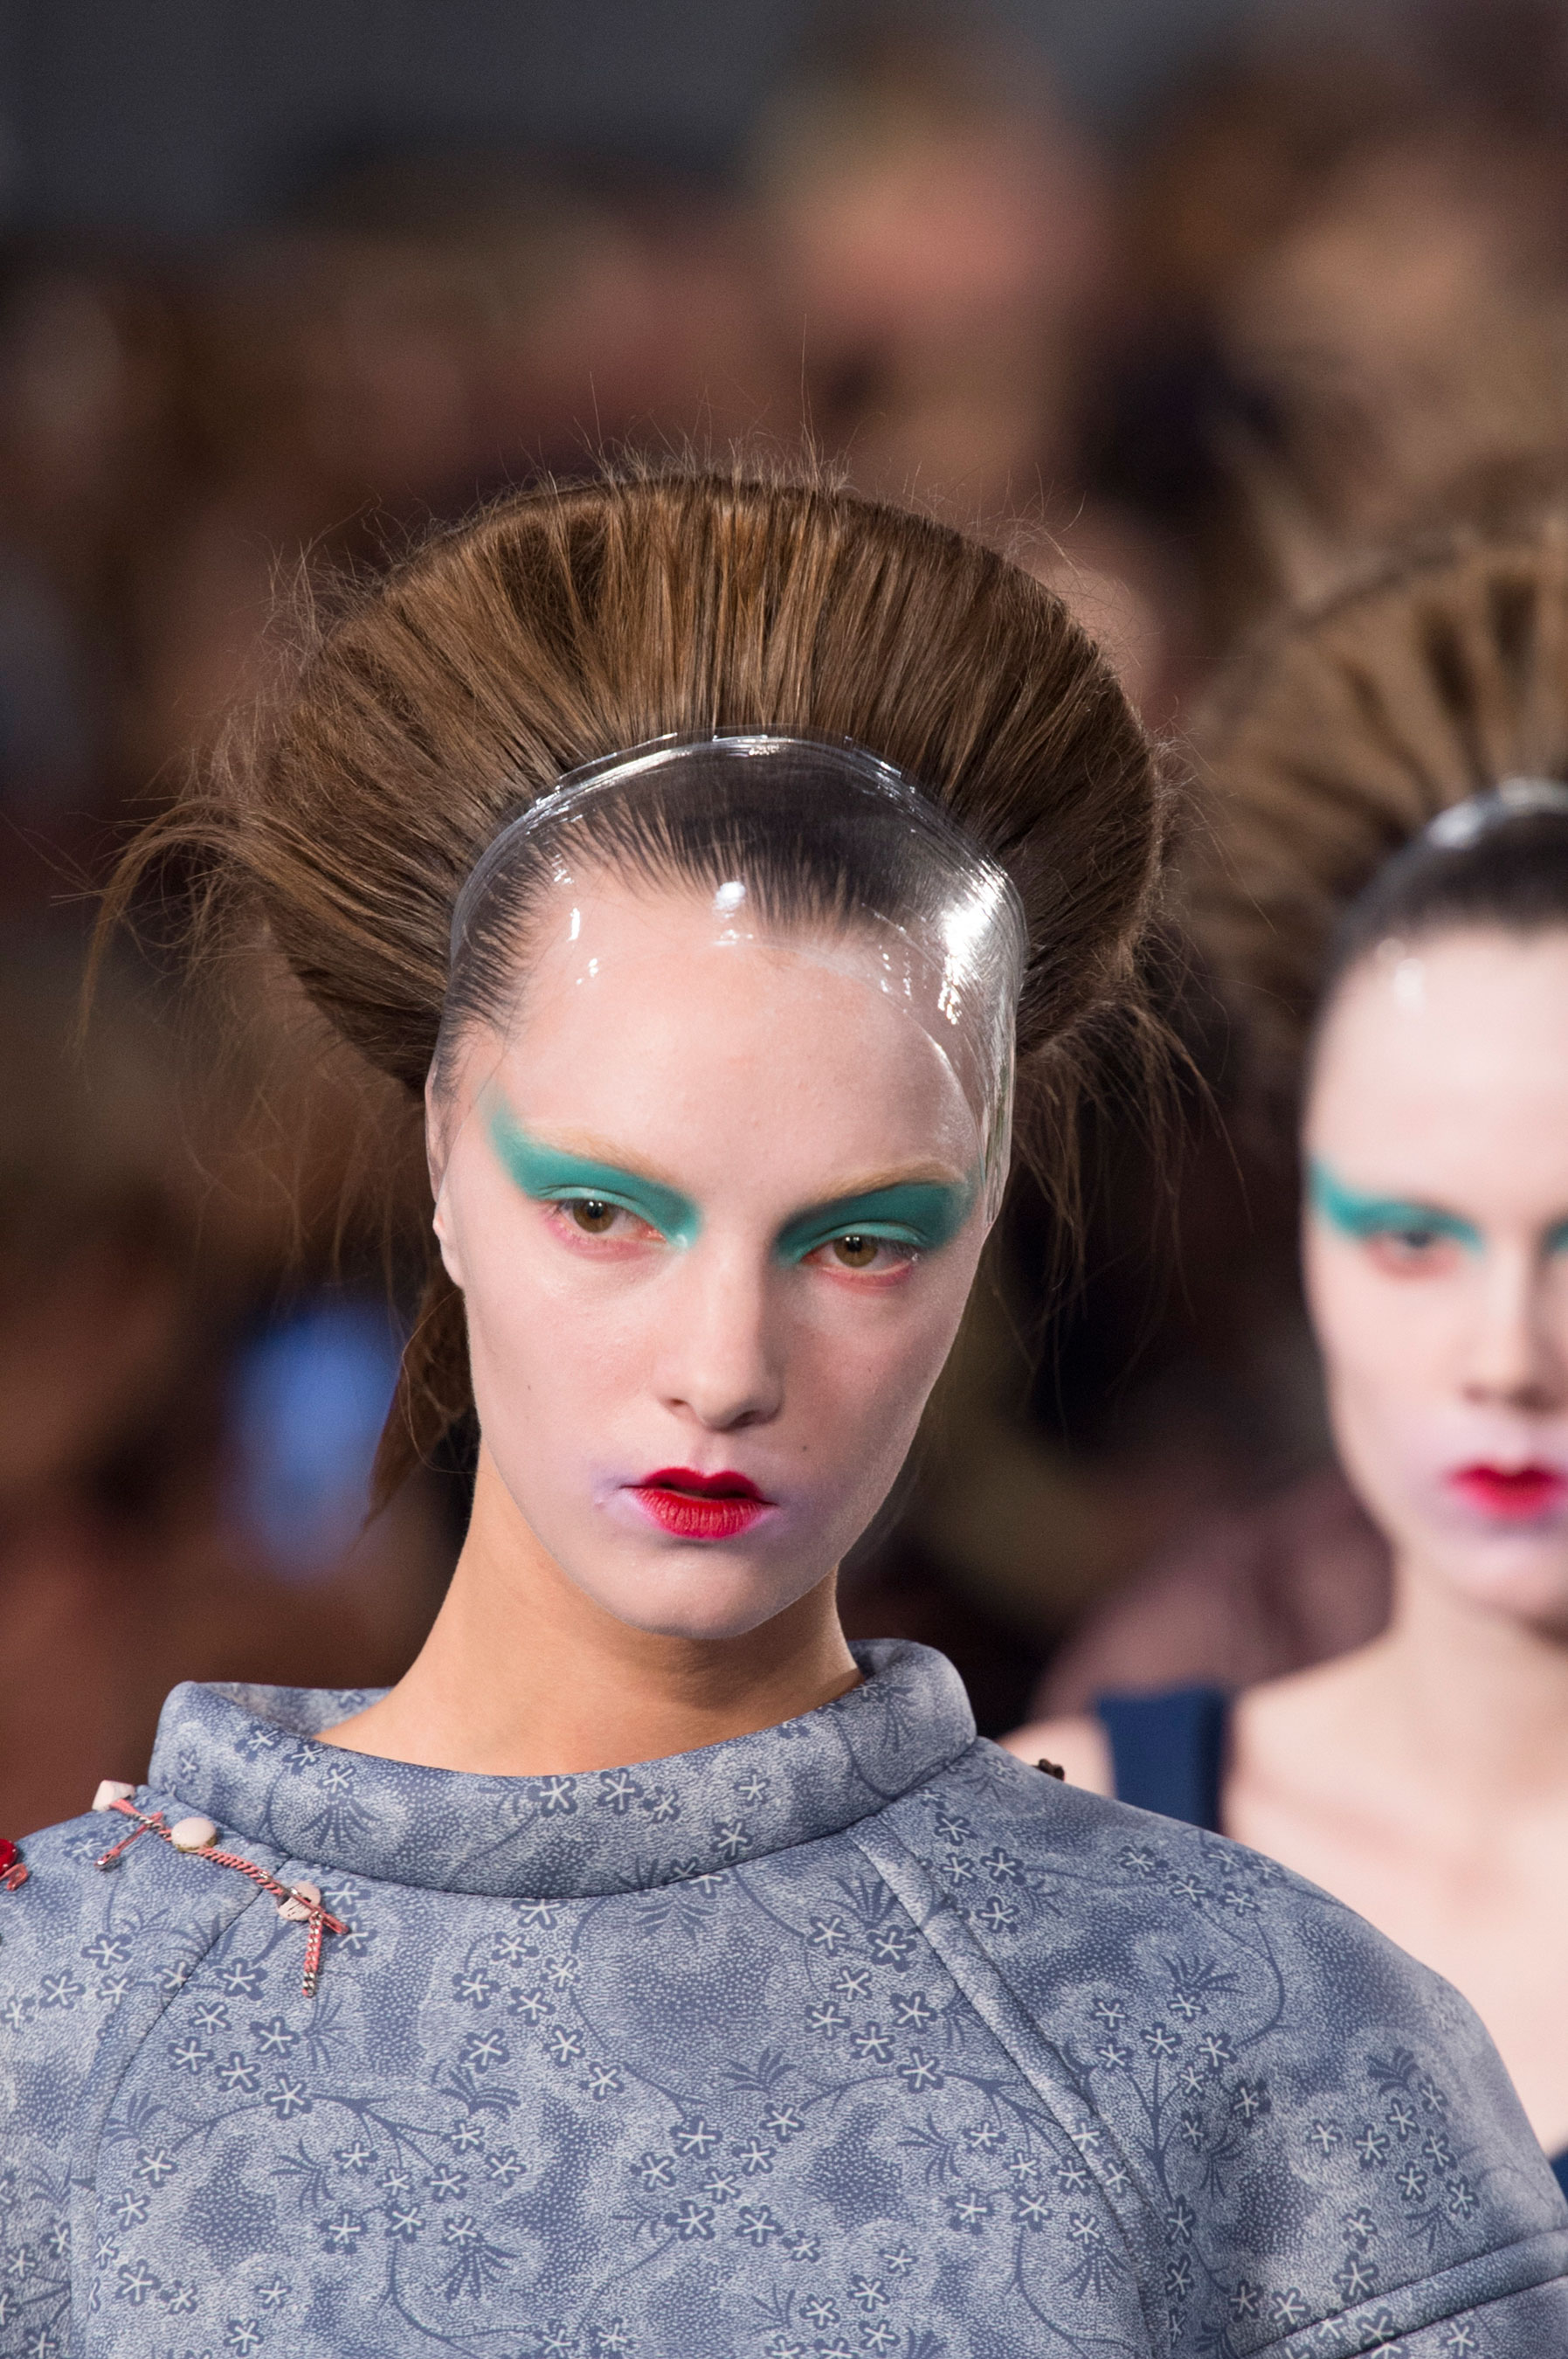 Maison-Margiela-spring-2016-runway-beauty-fashion-show-the-impression-080